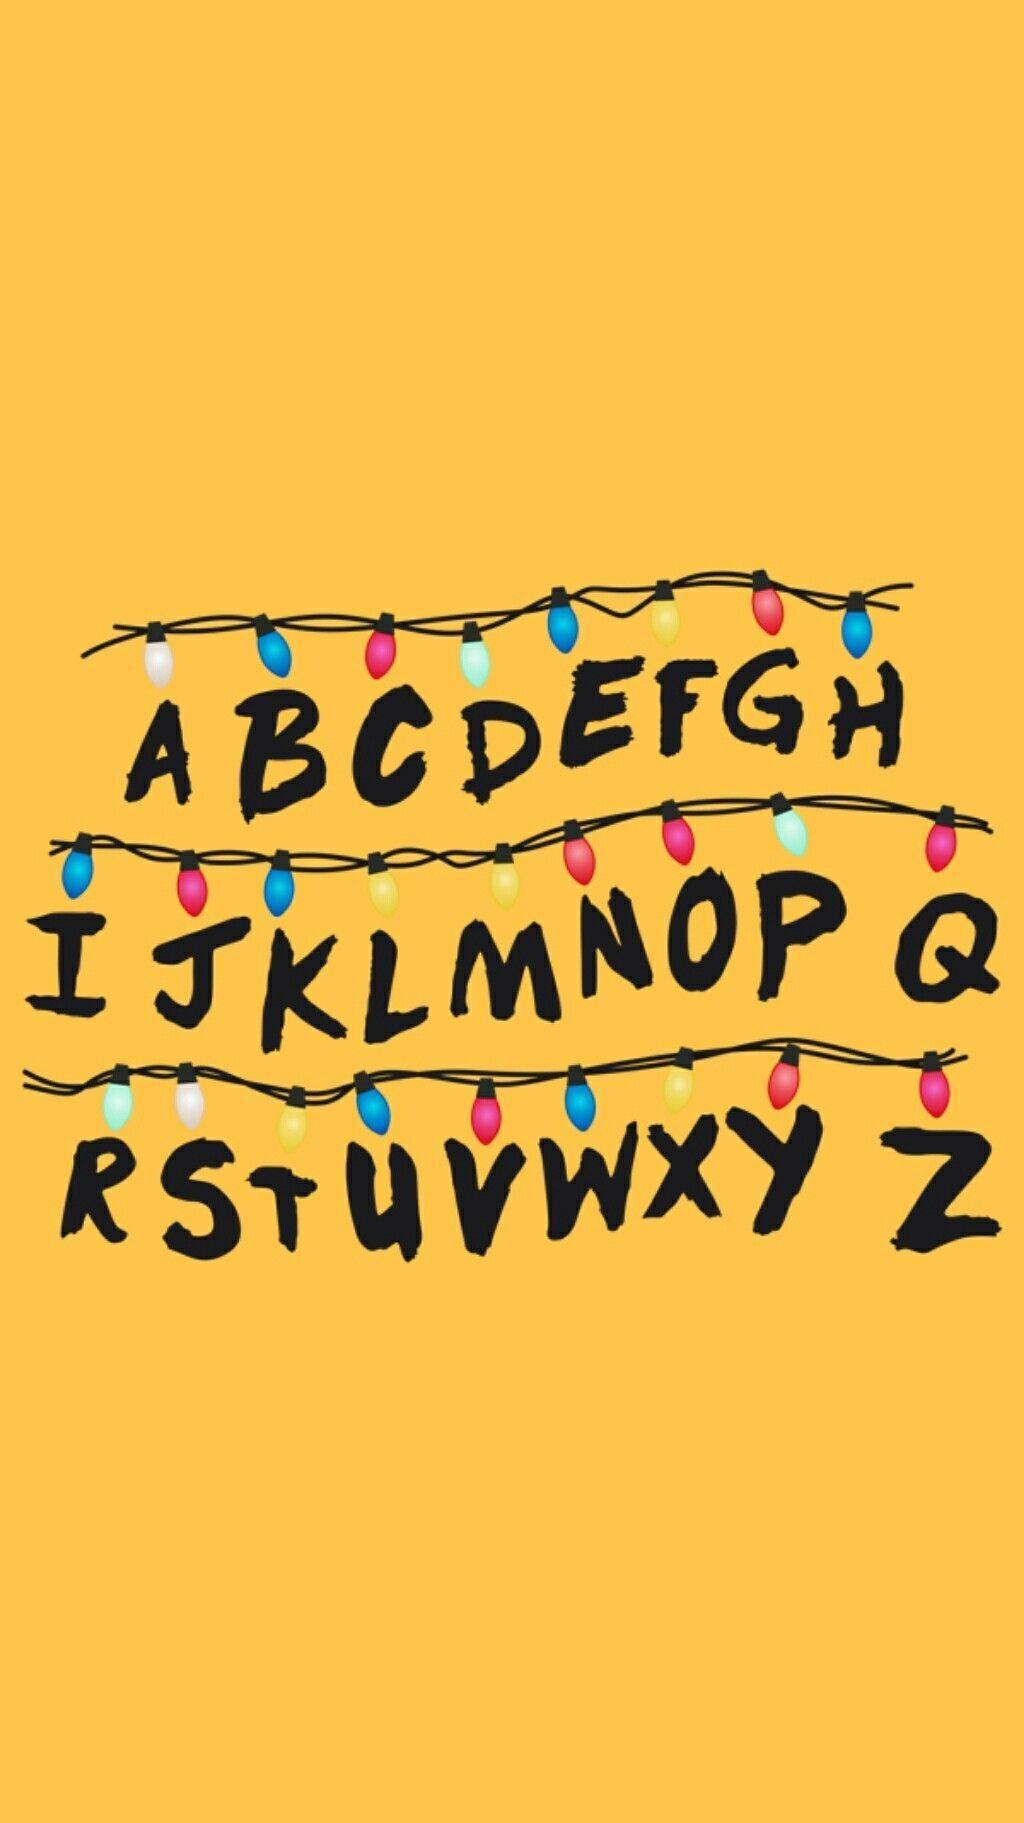 Yellow Aesthetic Tumblr Wallpapers - Top Free Yellow